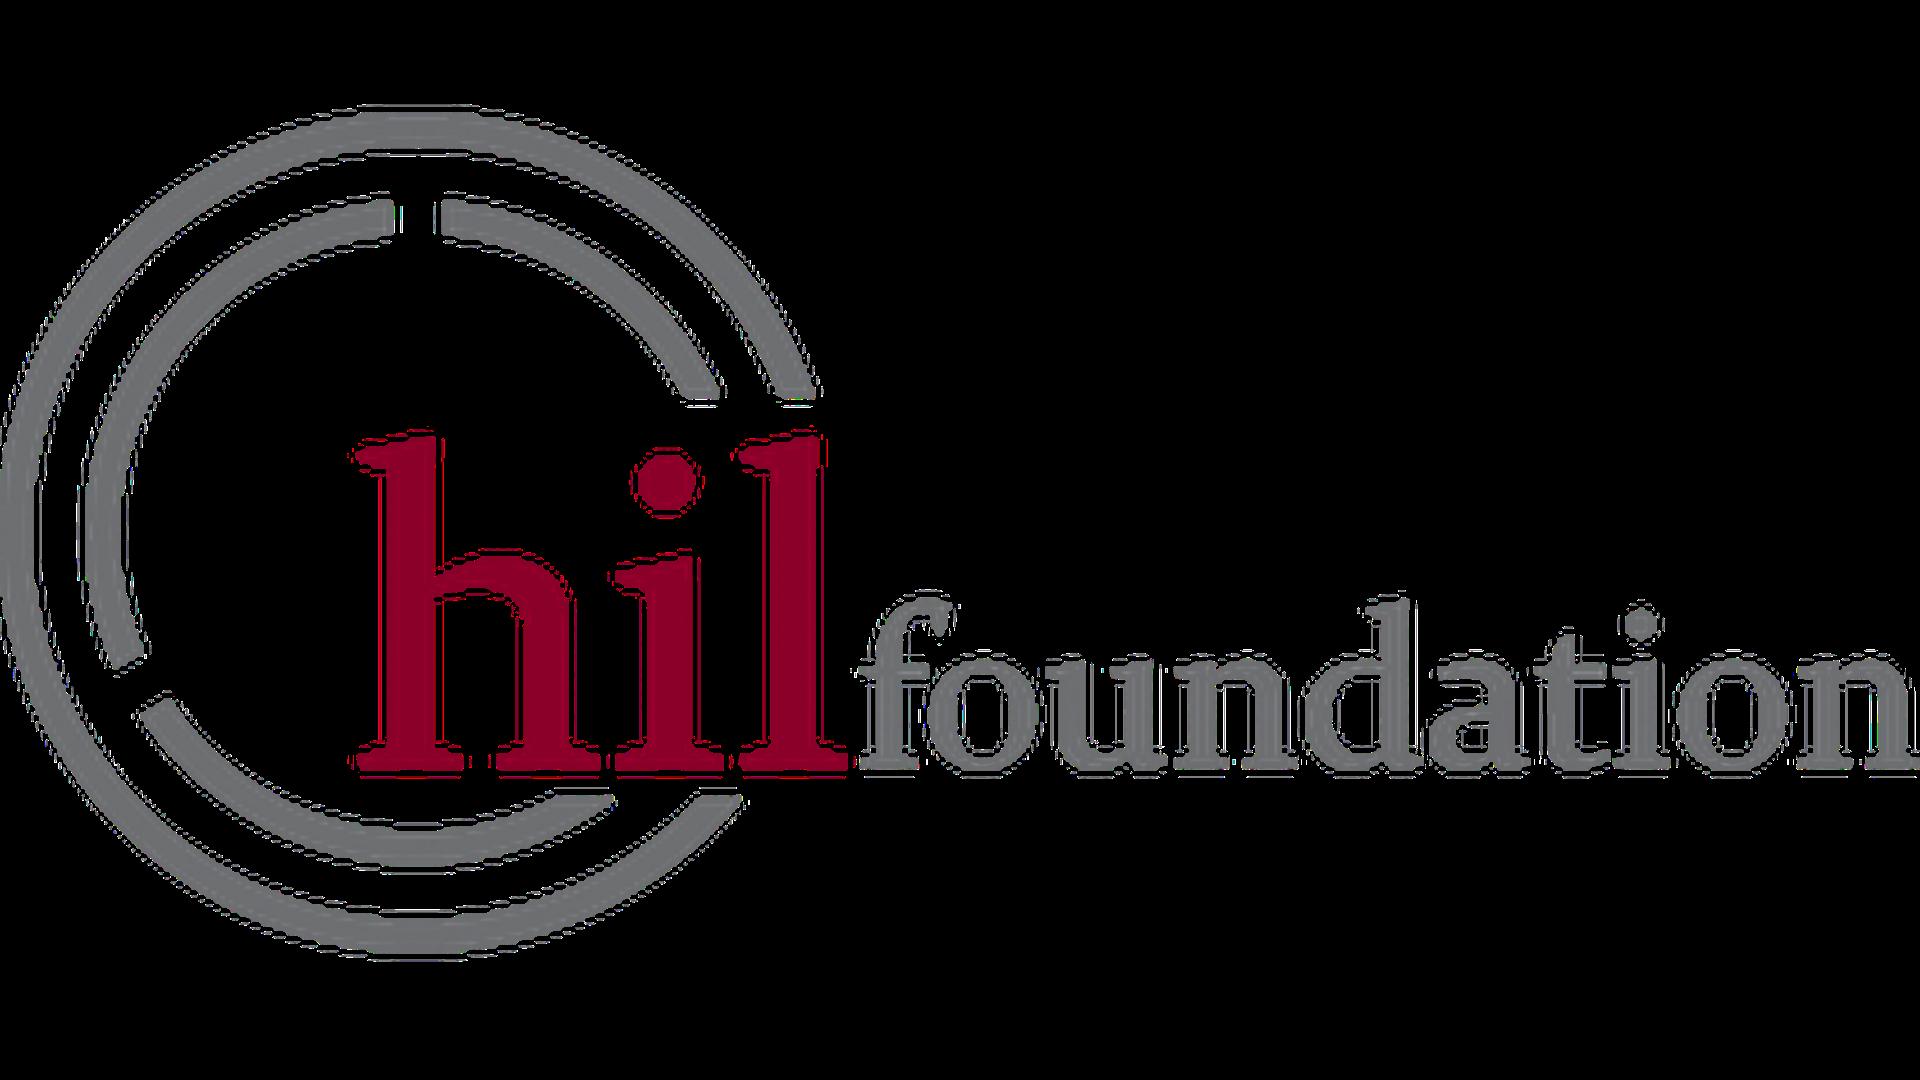 HIL-FOUNDATION Logos_HILfoundation_Logo_4c.png